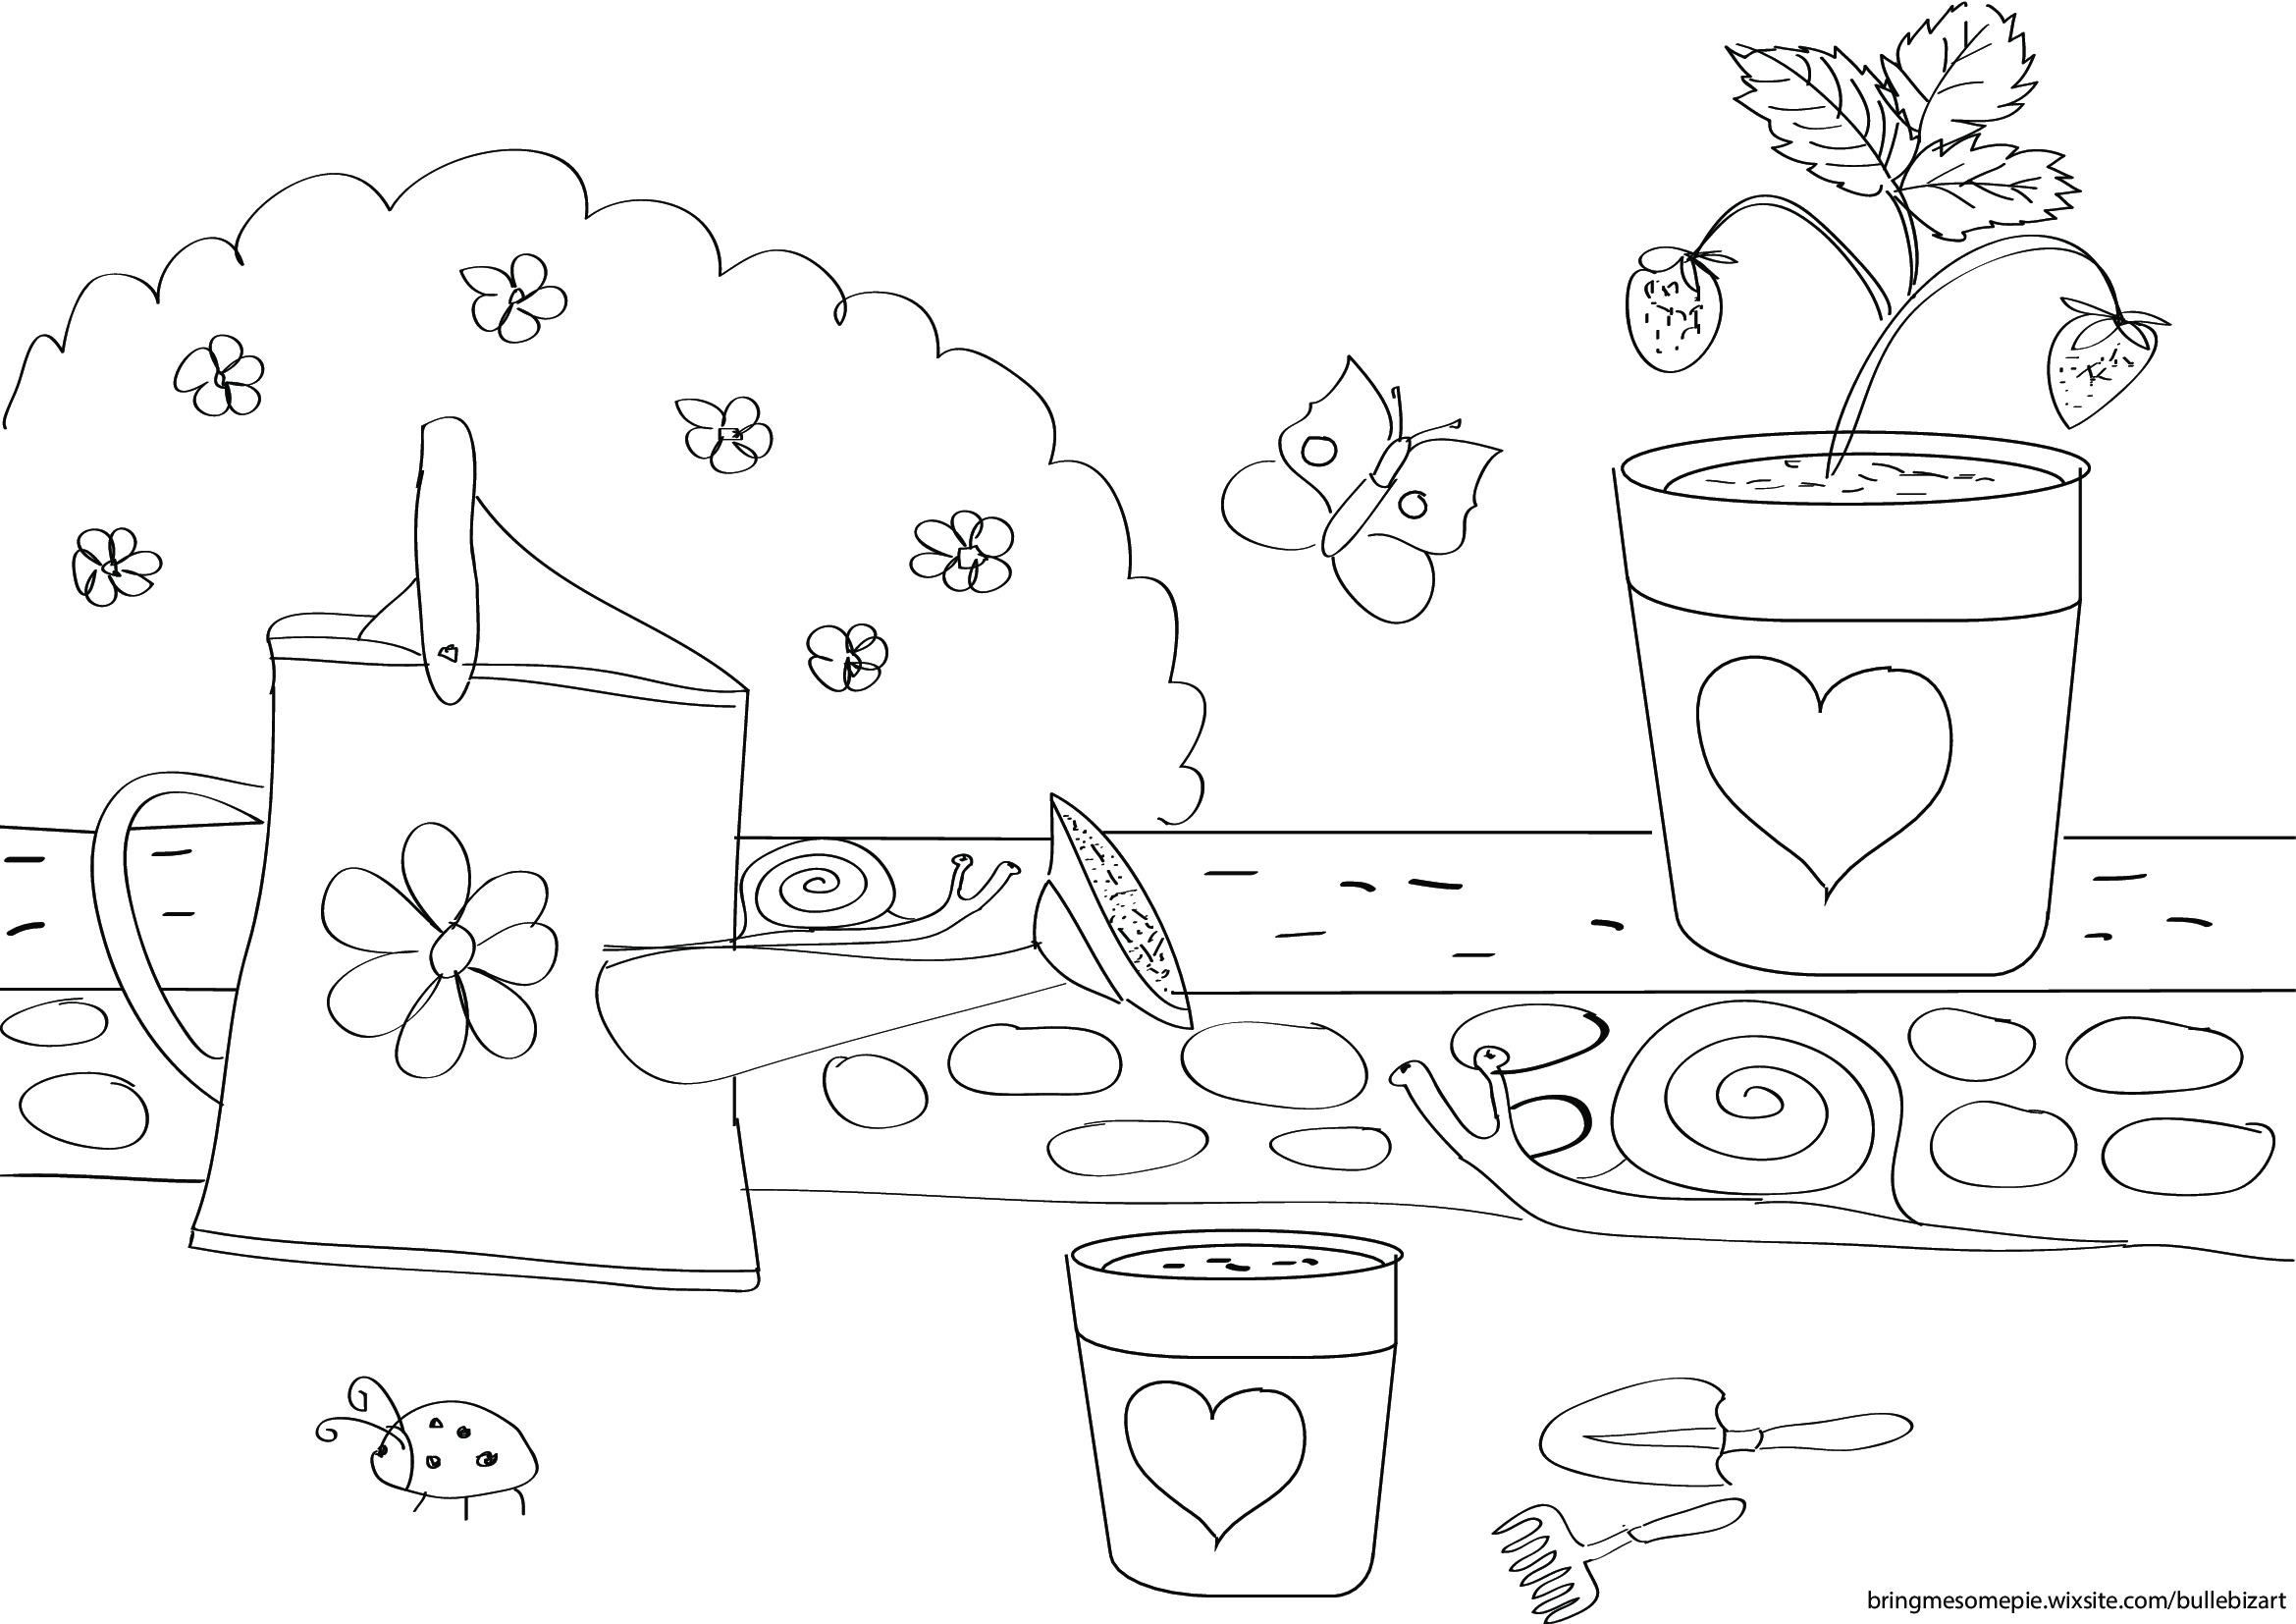 Coloriage_plantes